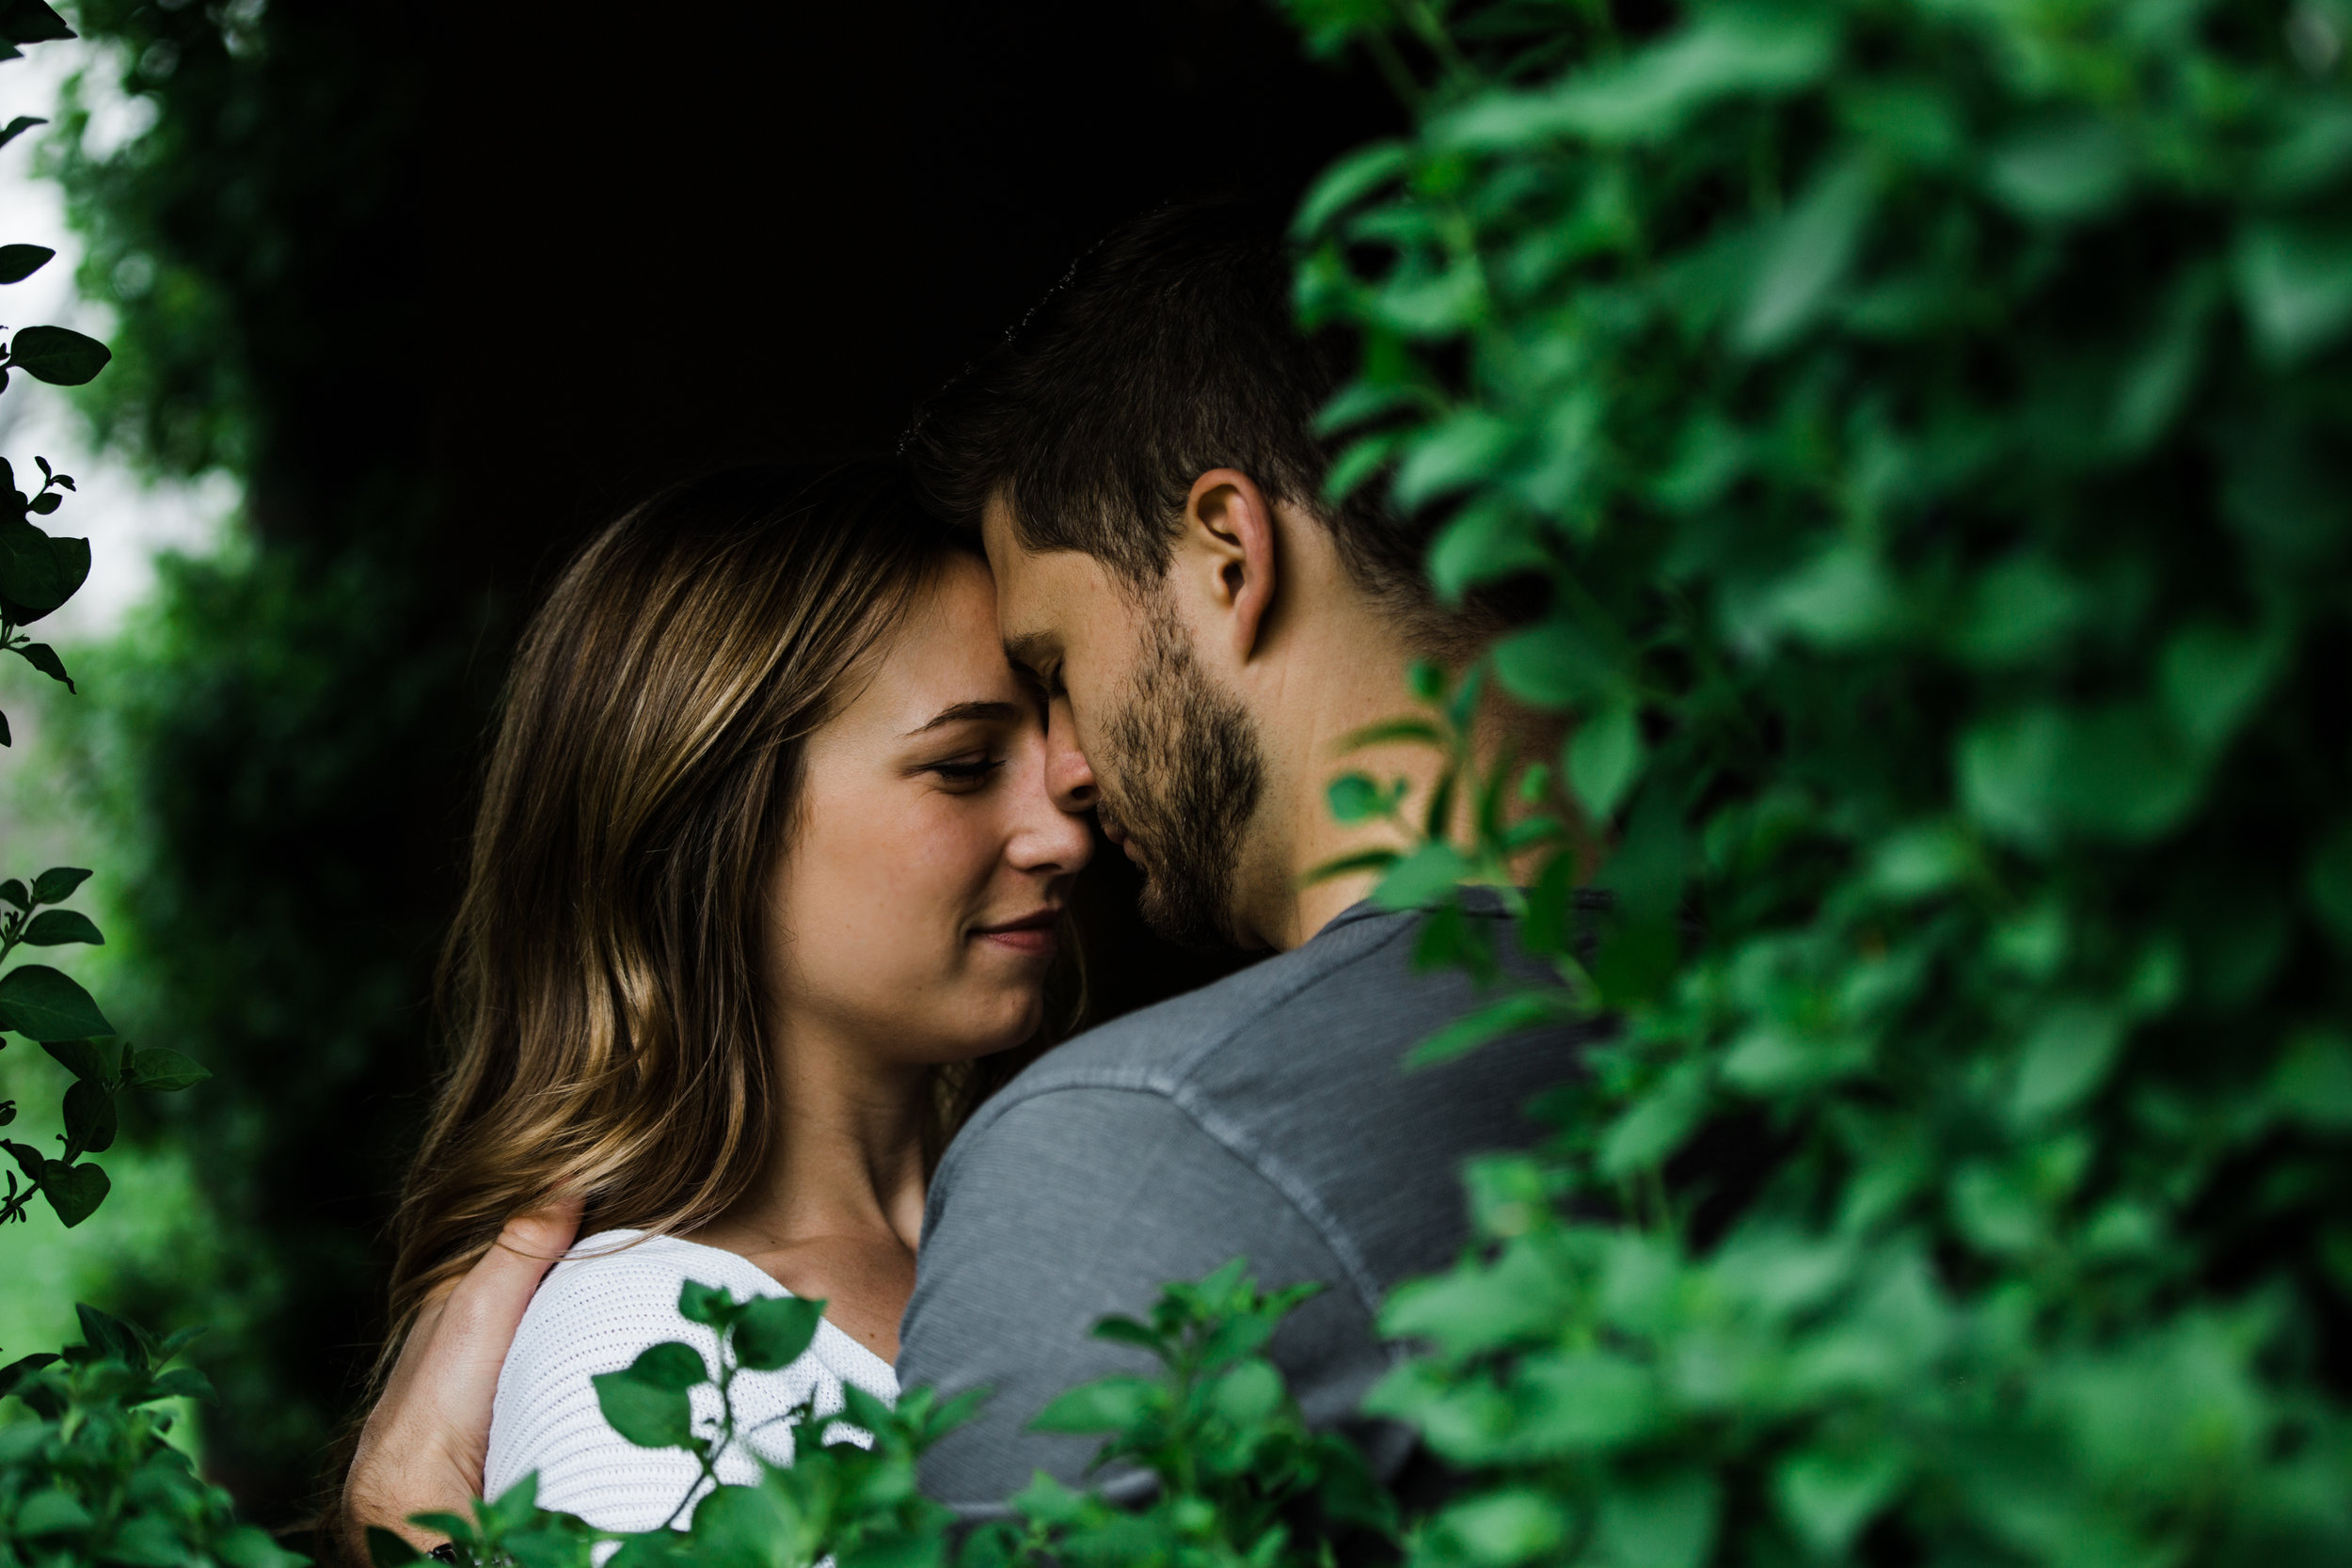 Dallas-Texas-Engagement-Session-Dallas-Arboretum-L.A.R.Weddings-Lindsey-Ramdin-23.jpg